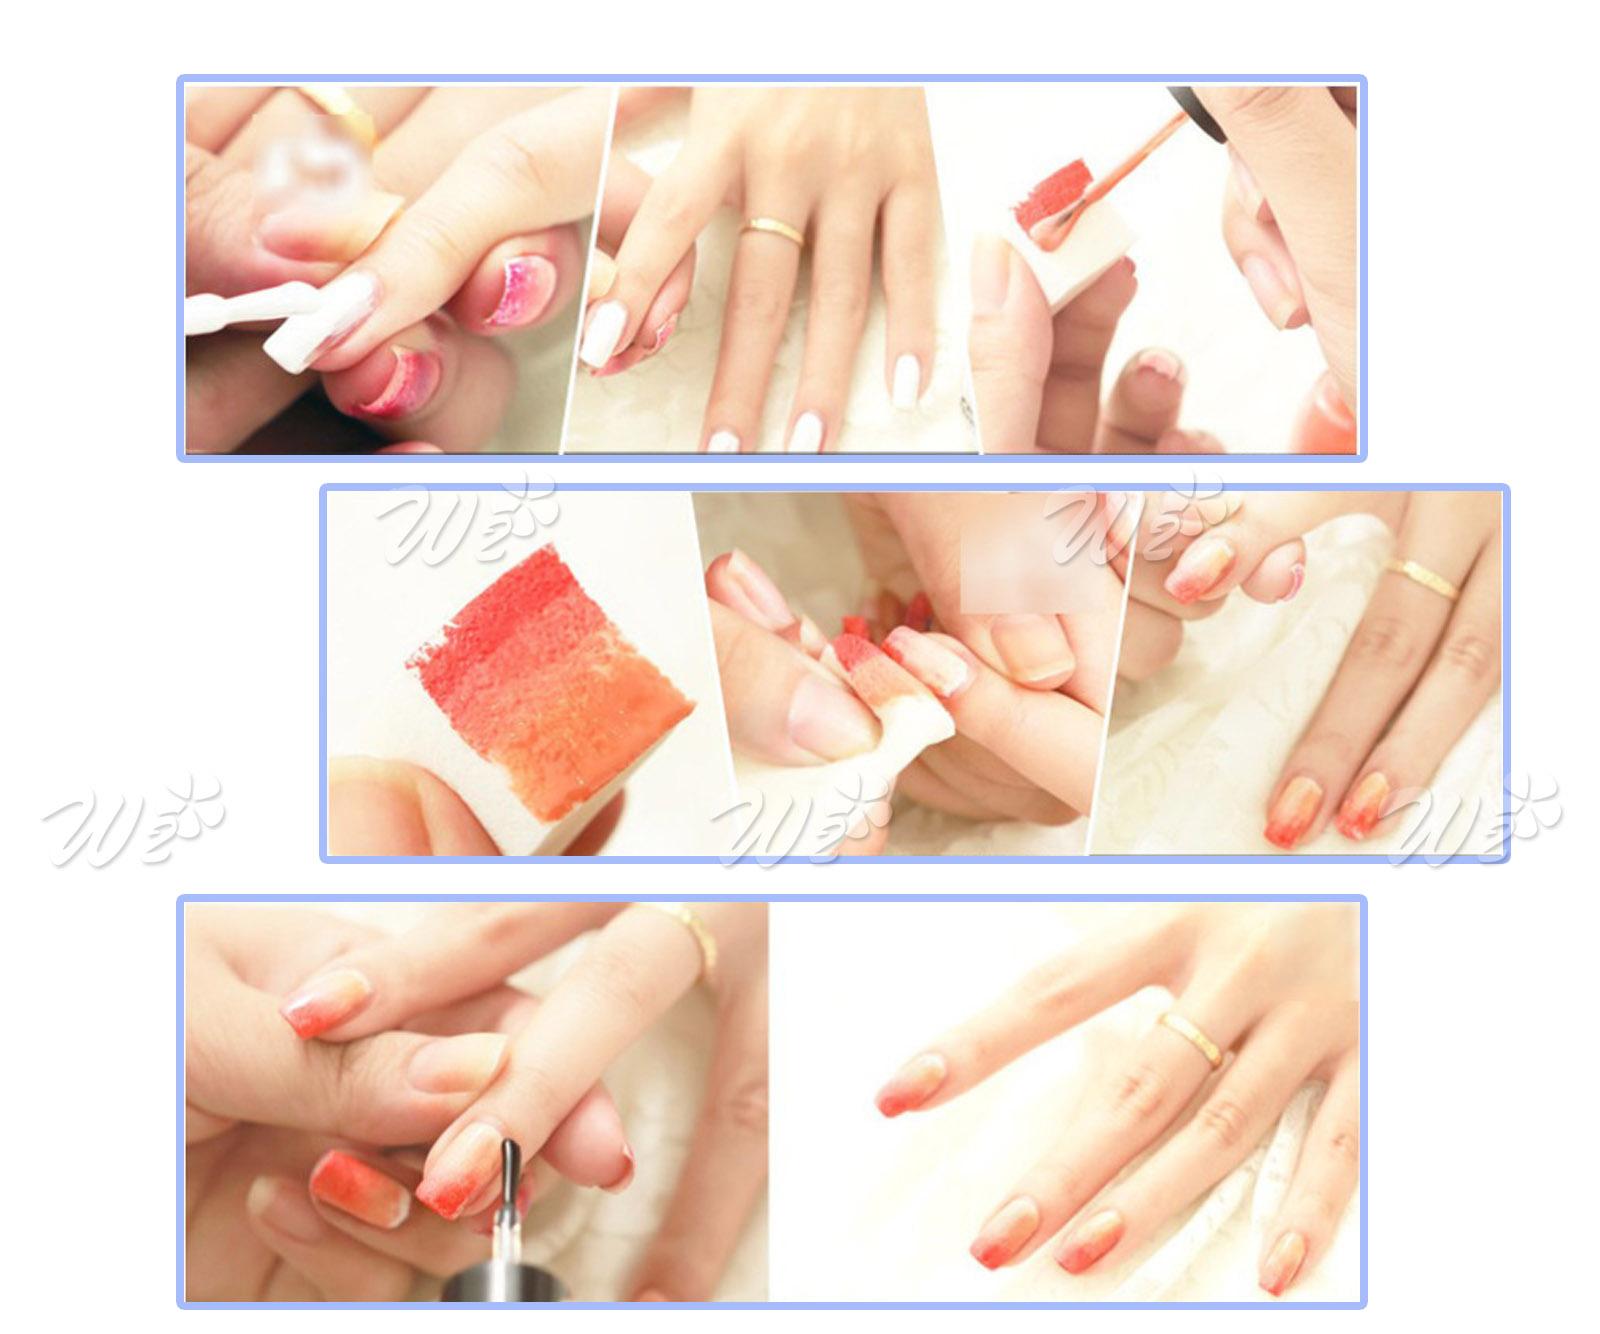 8pcs Nail Art Gradient Sponge Varnish Designs Stamp Polish Template